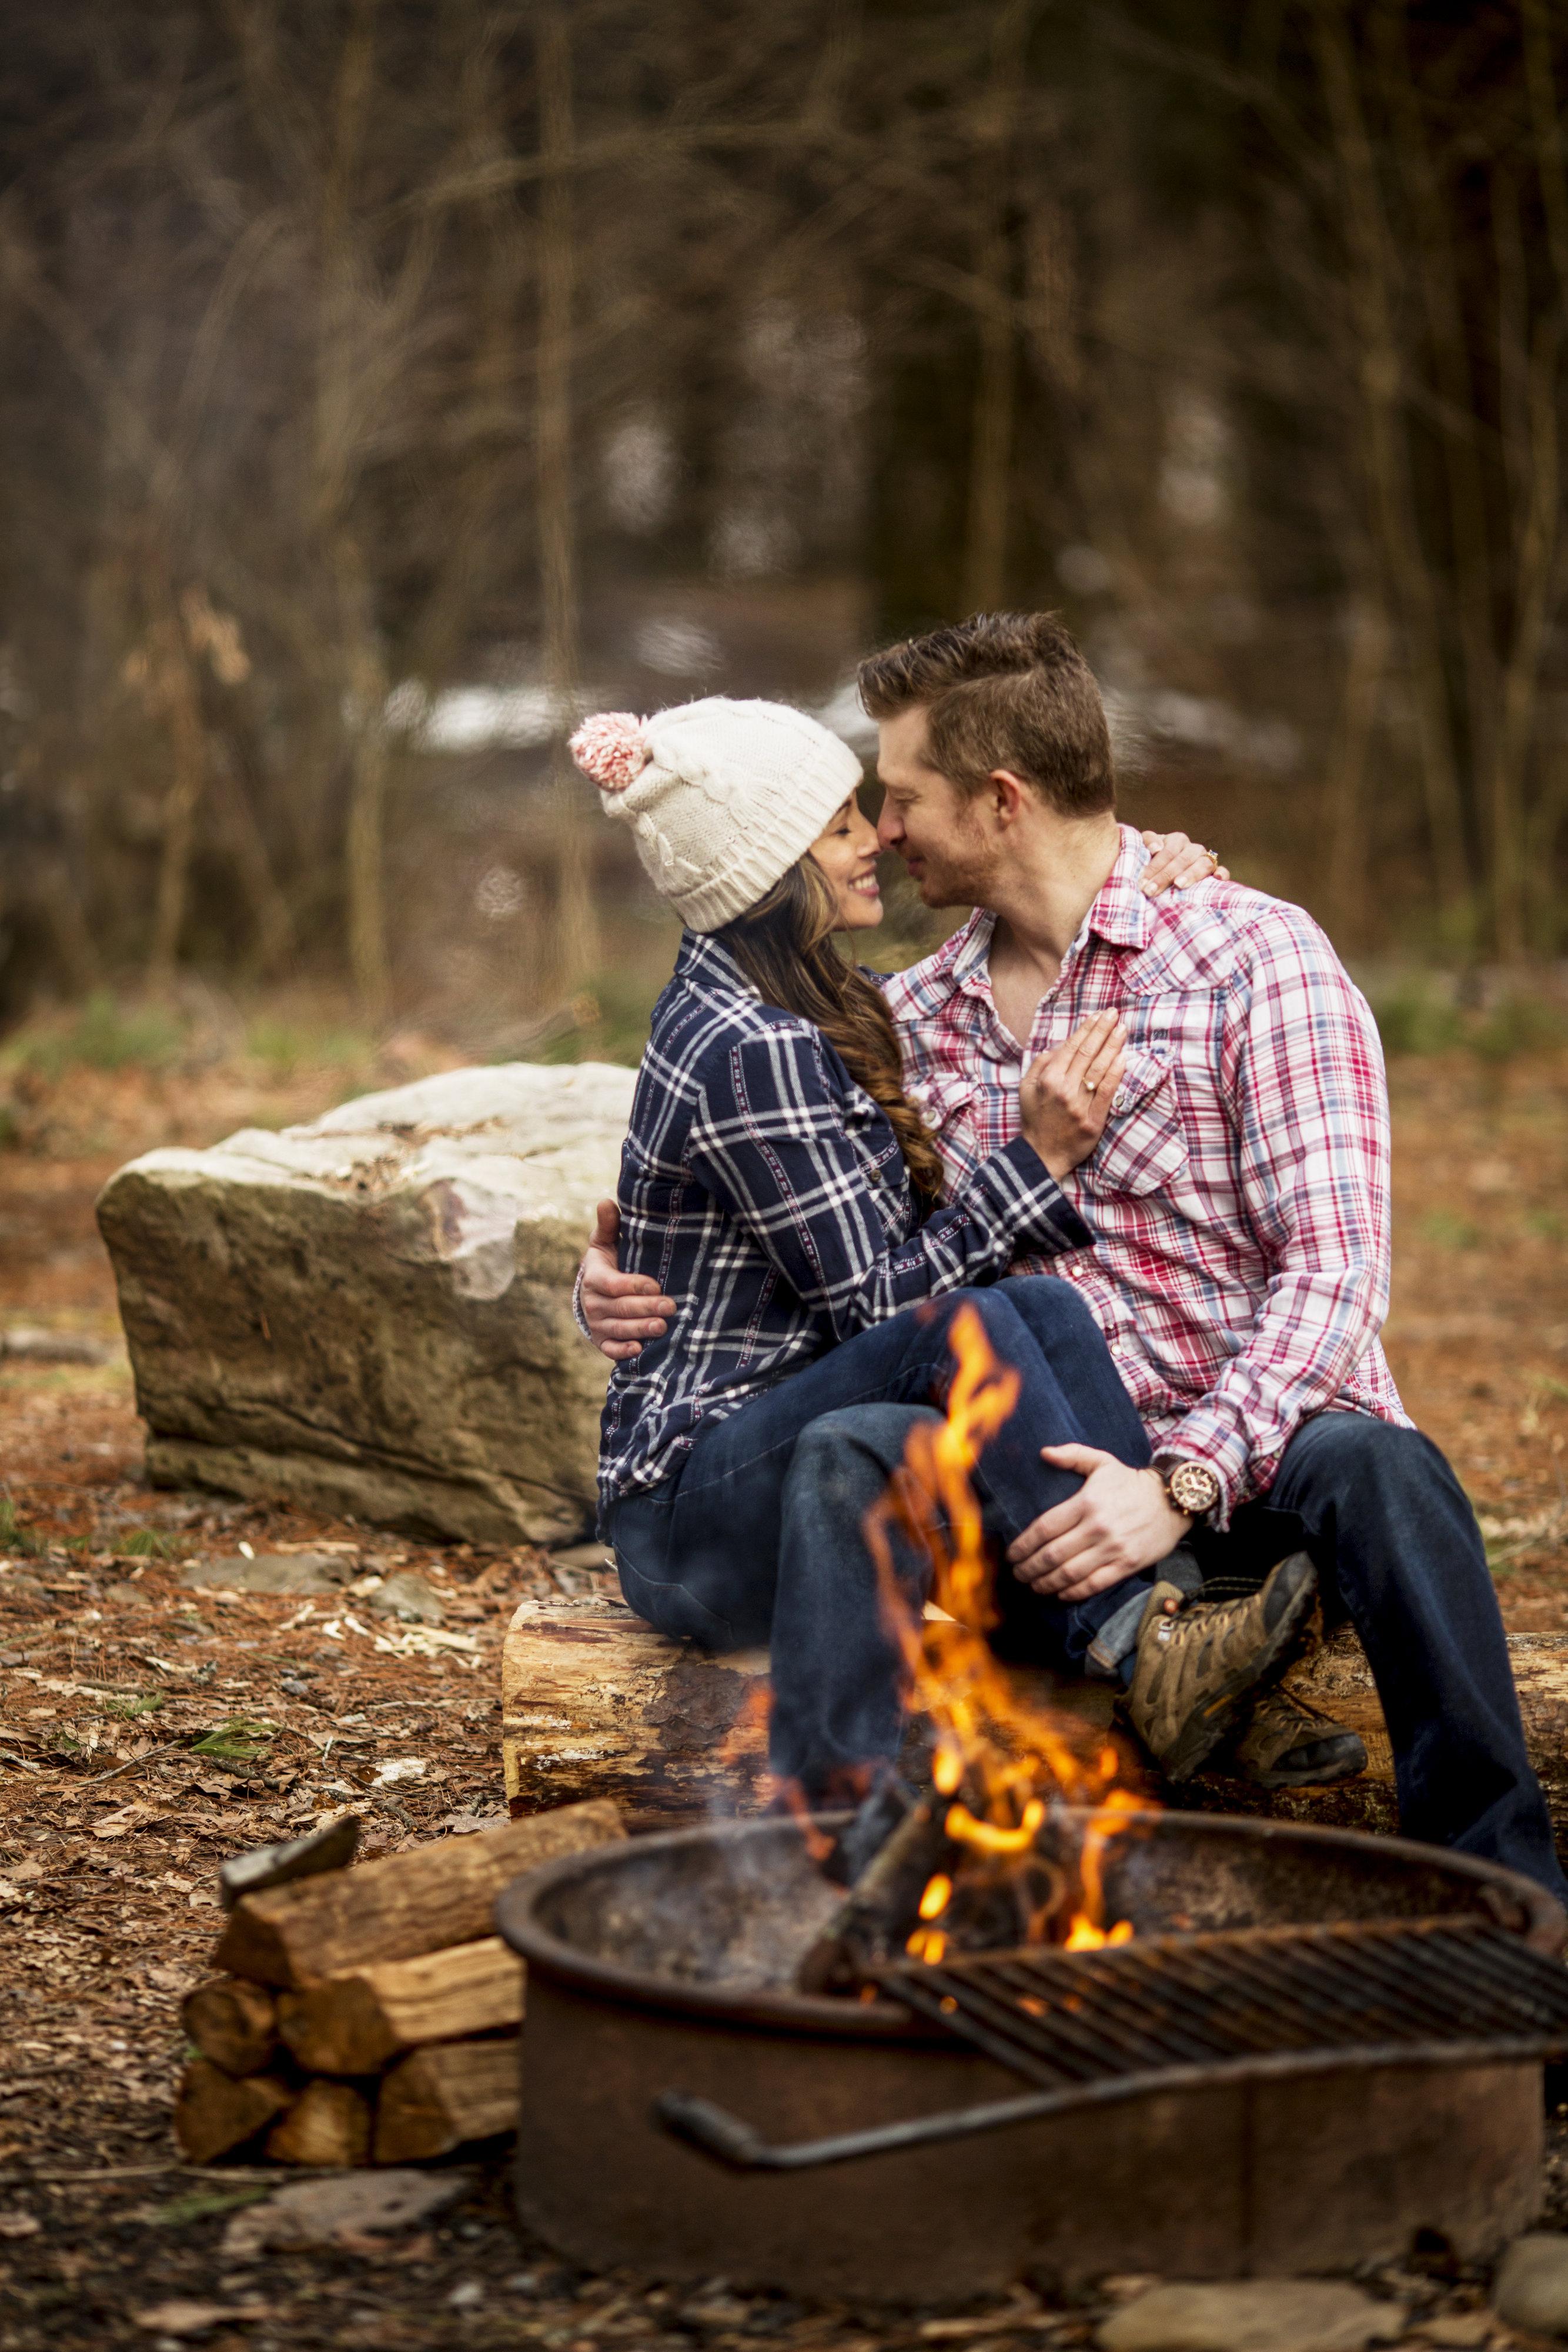 Engagement camping photoshoot